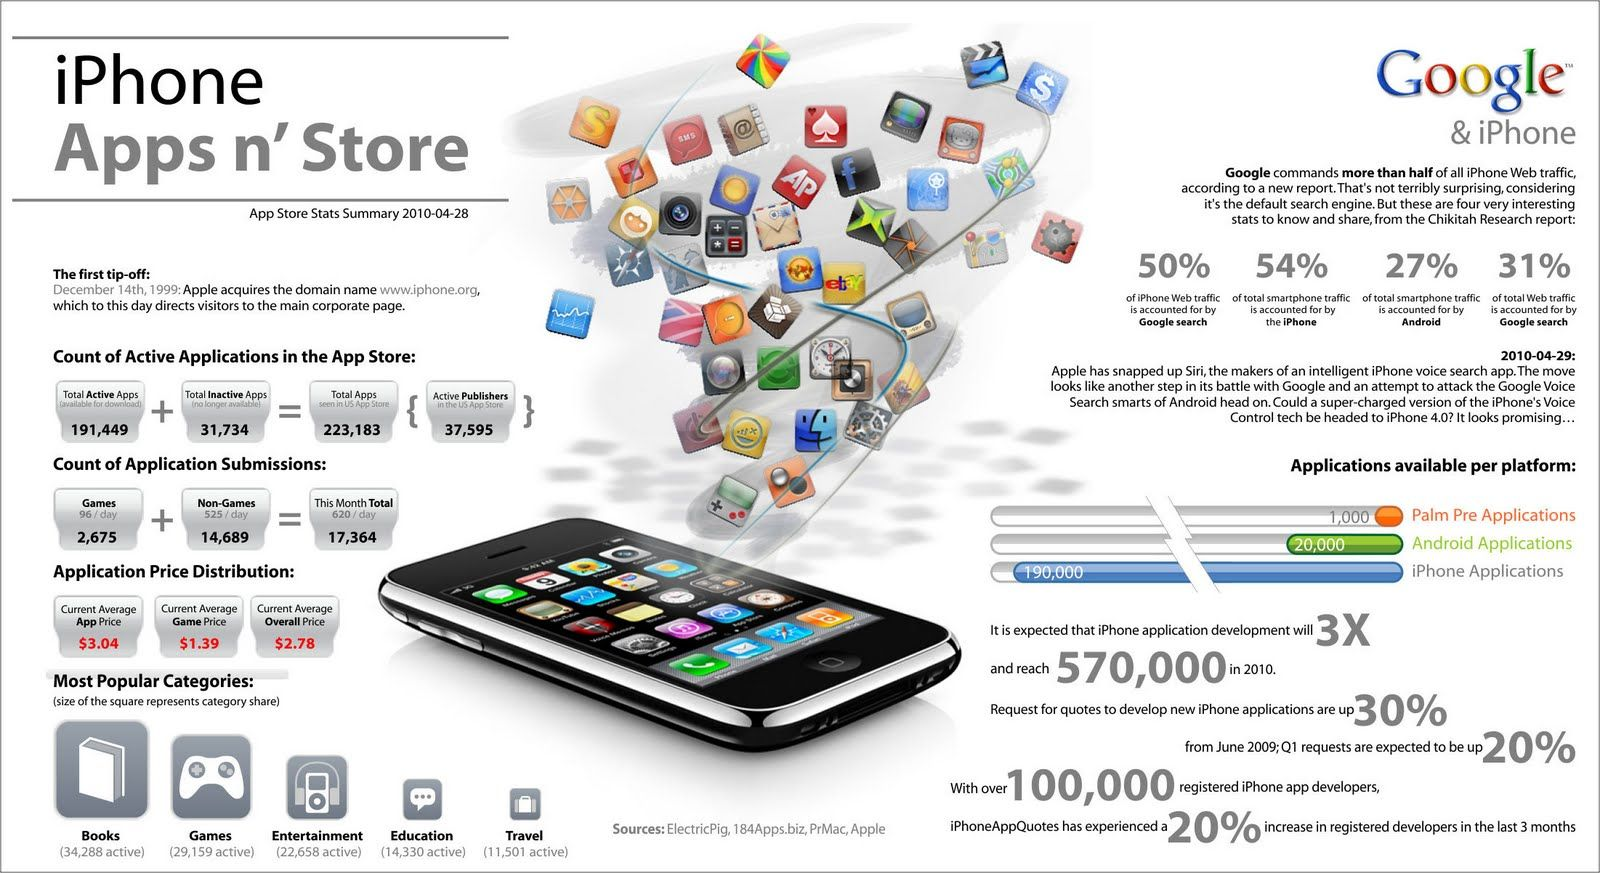 cnn app download statistics